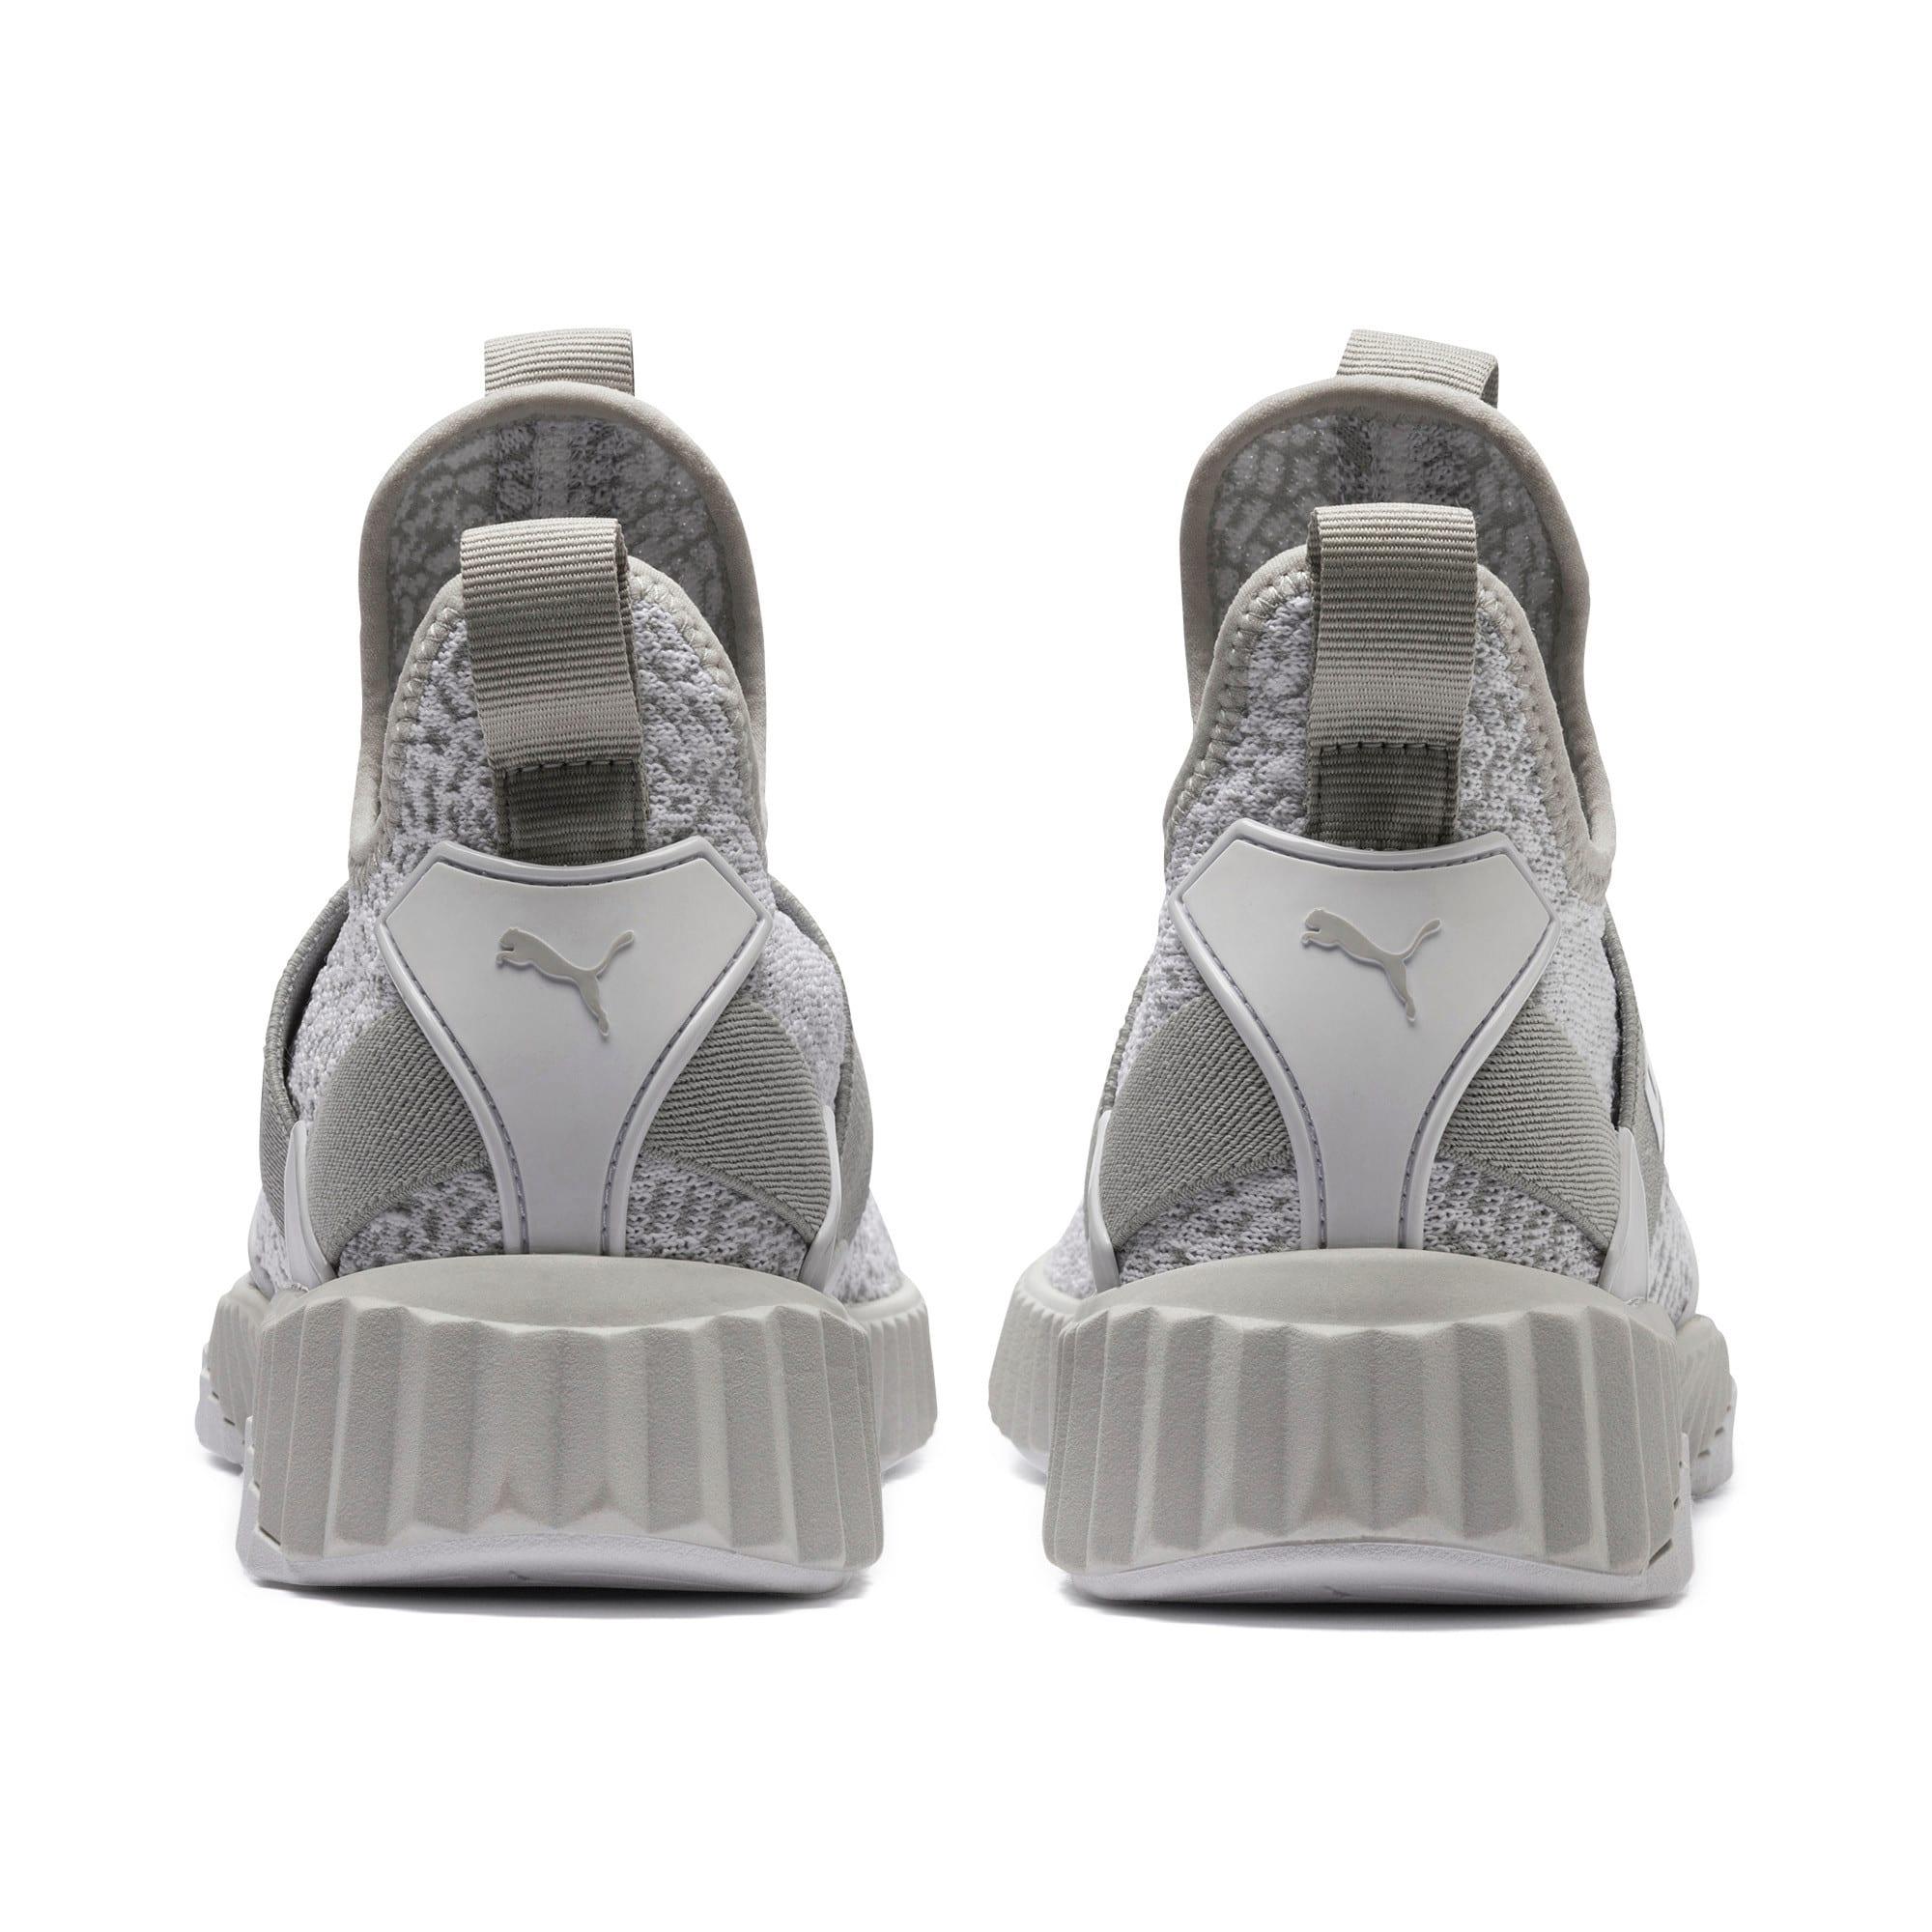 Thumbnail 4 of Defy Mid Animal Women's Training Shoes, Gray Violet-Puma White, medium